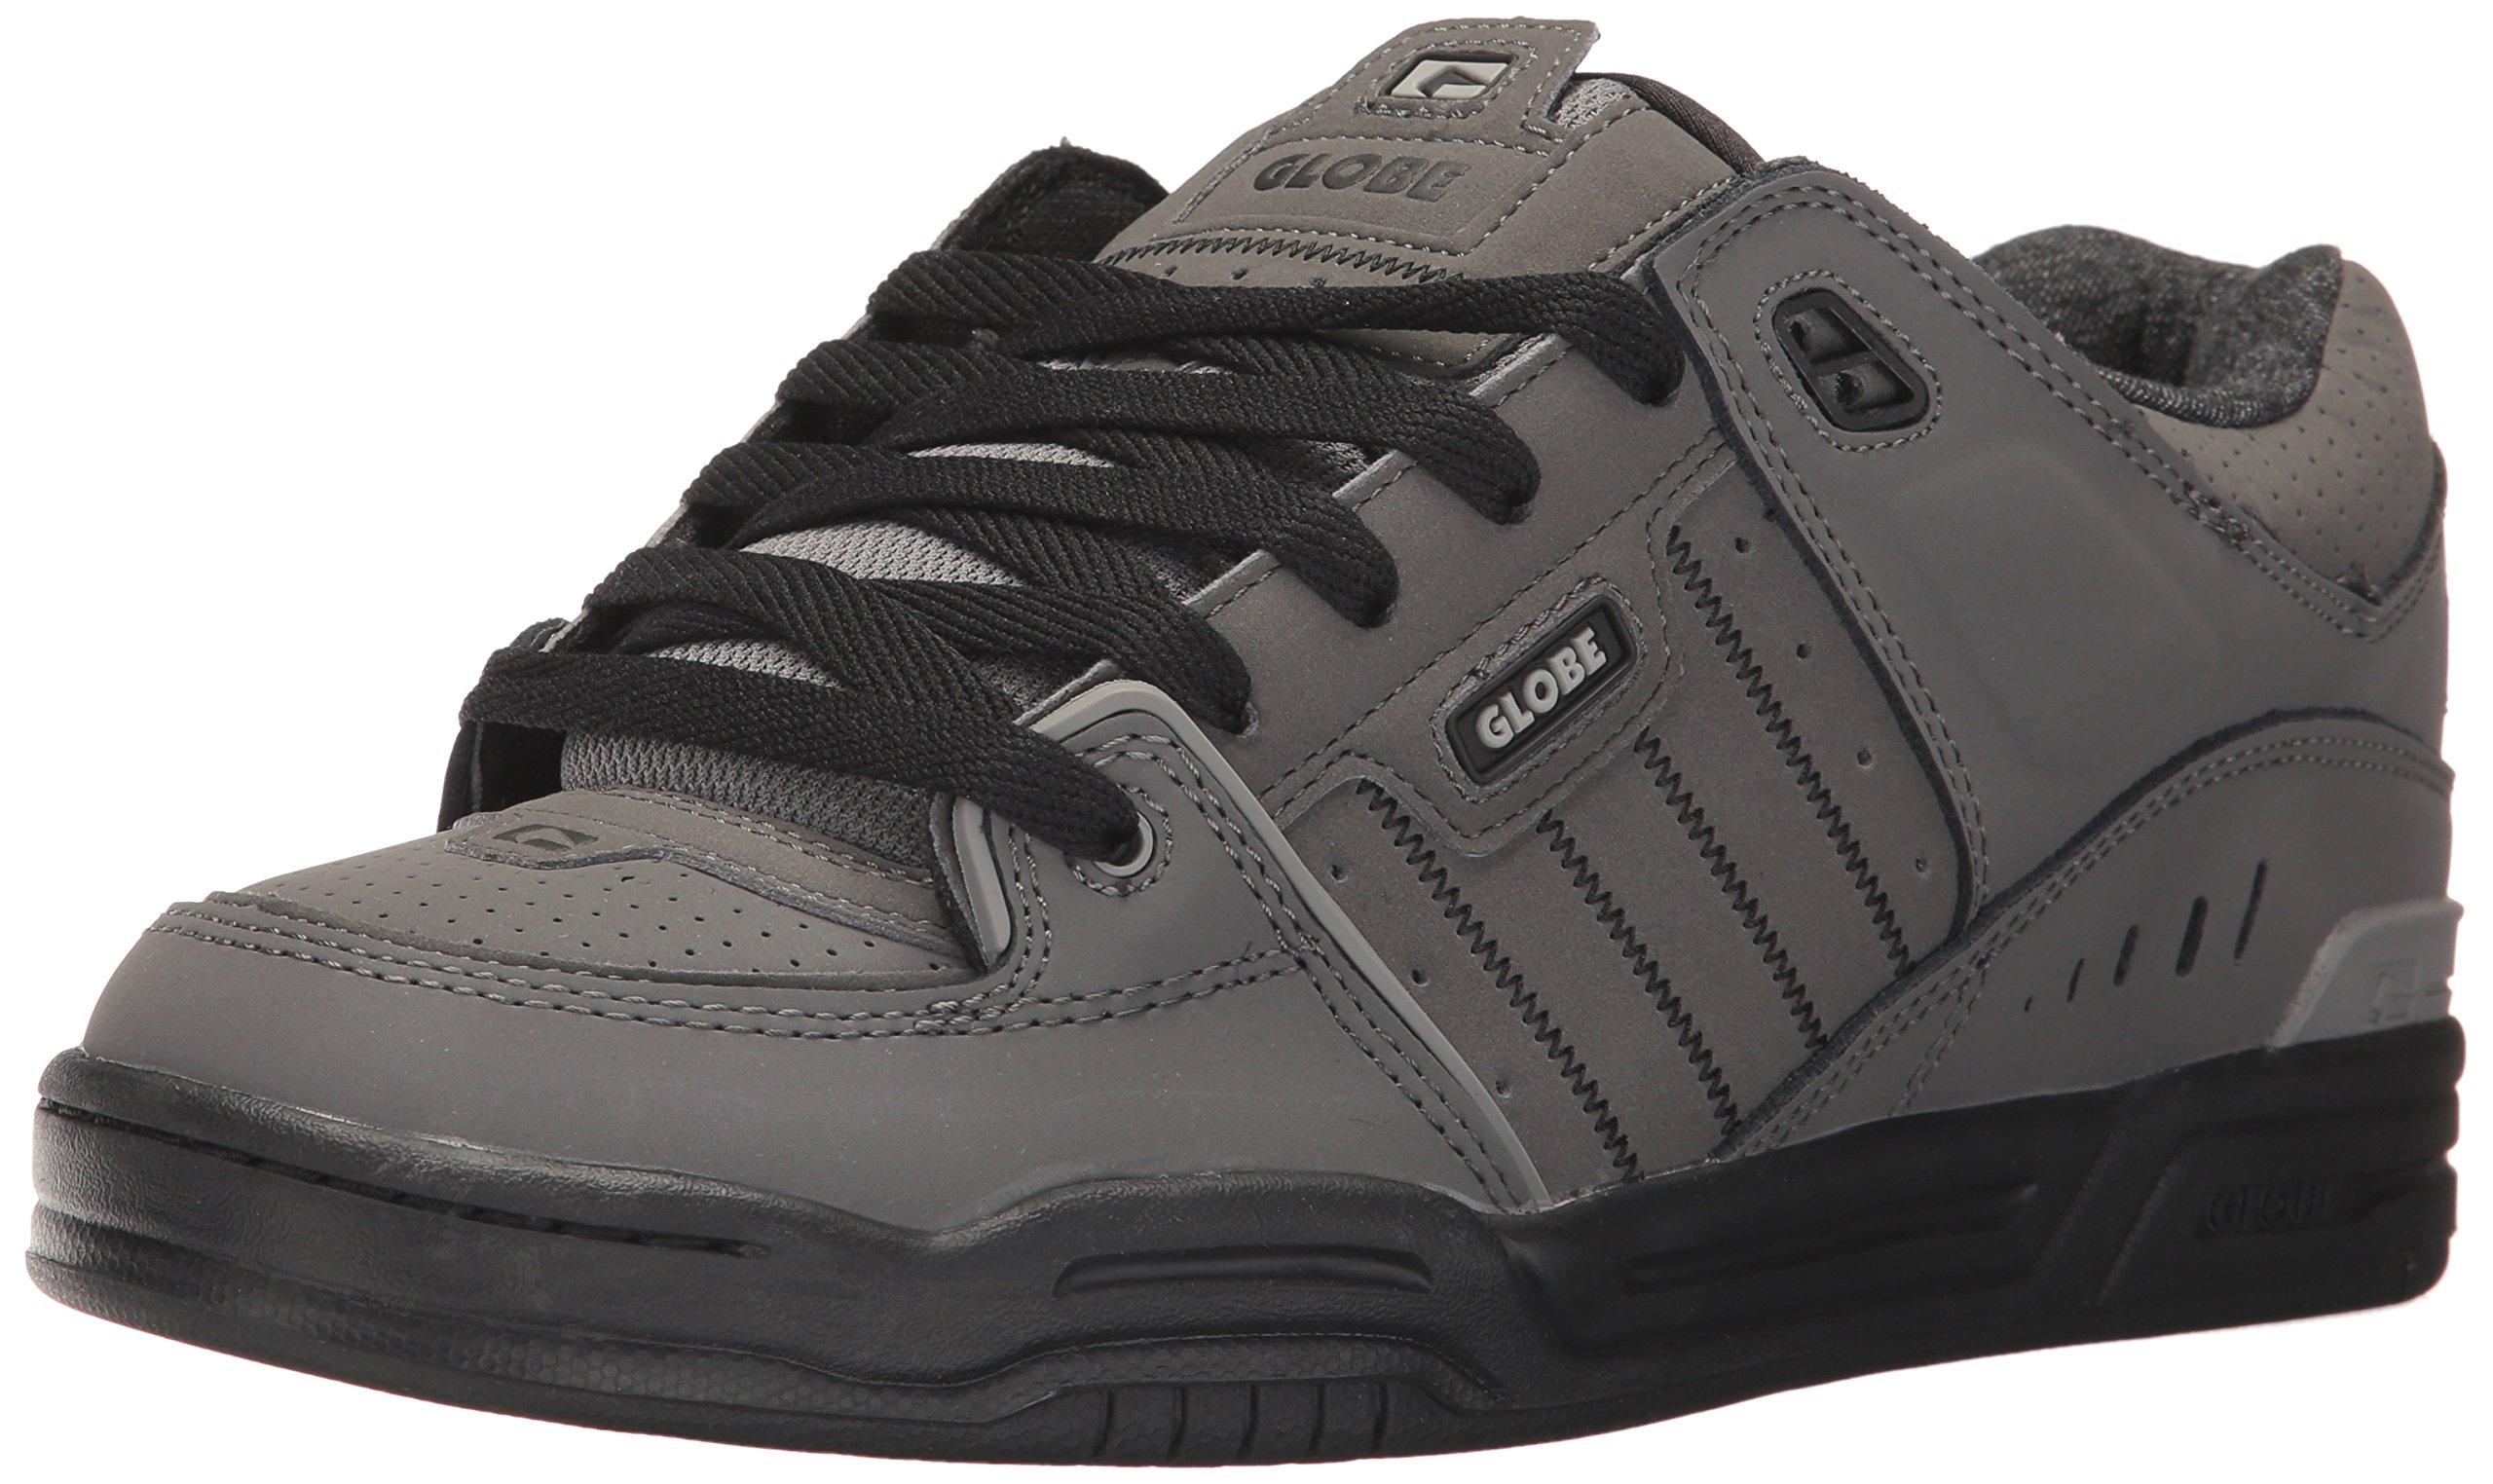 Globe Men's Fusion Skate Shoe, Charcoal/Knit, 5